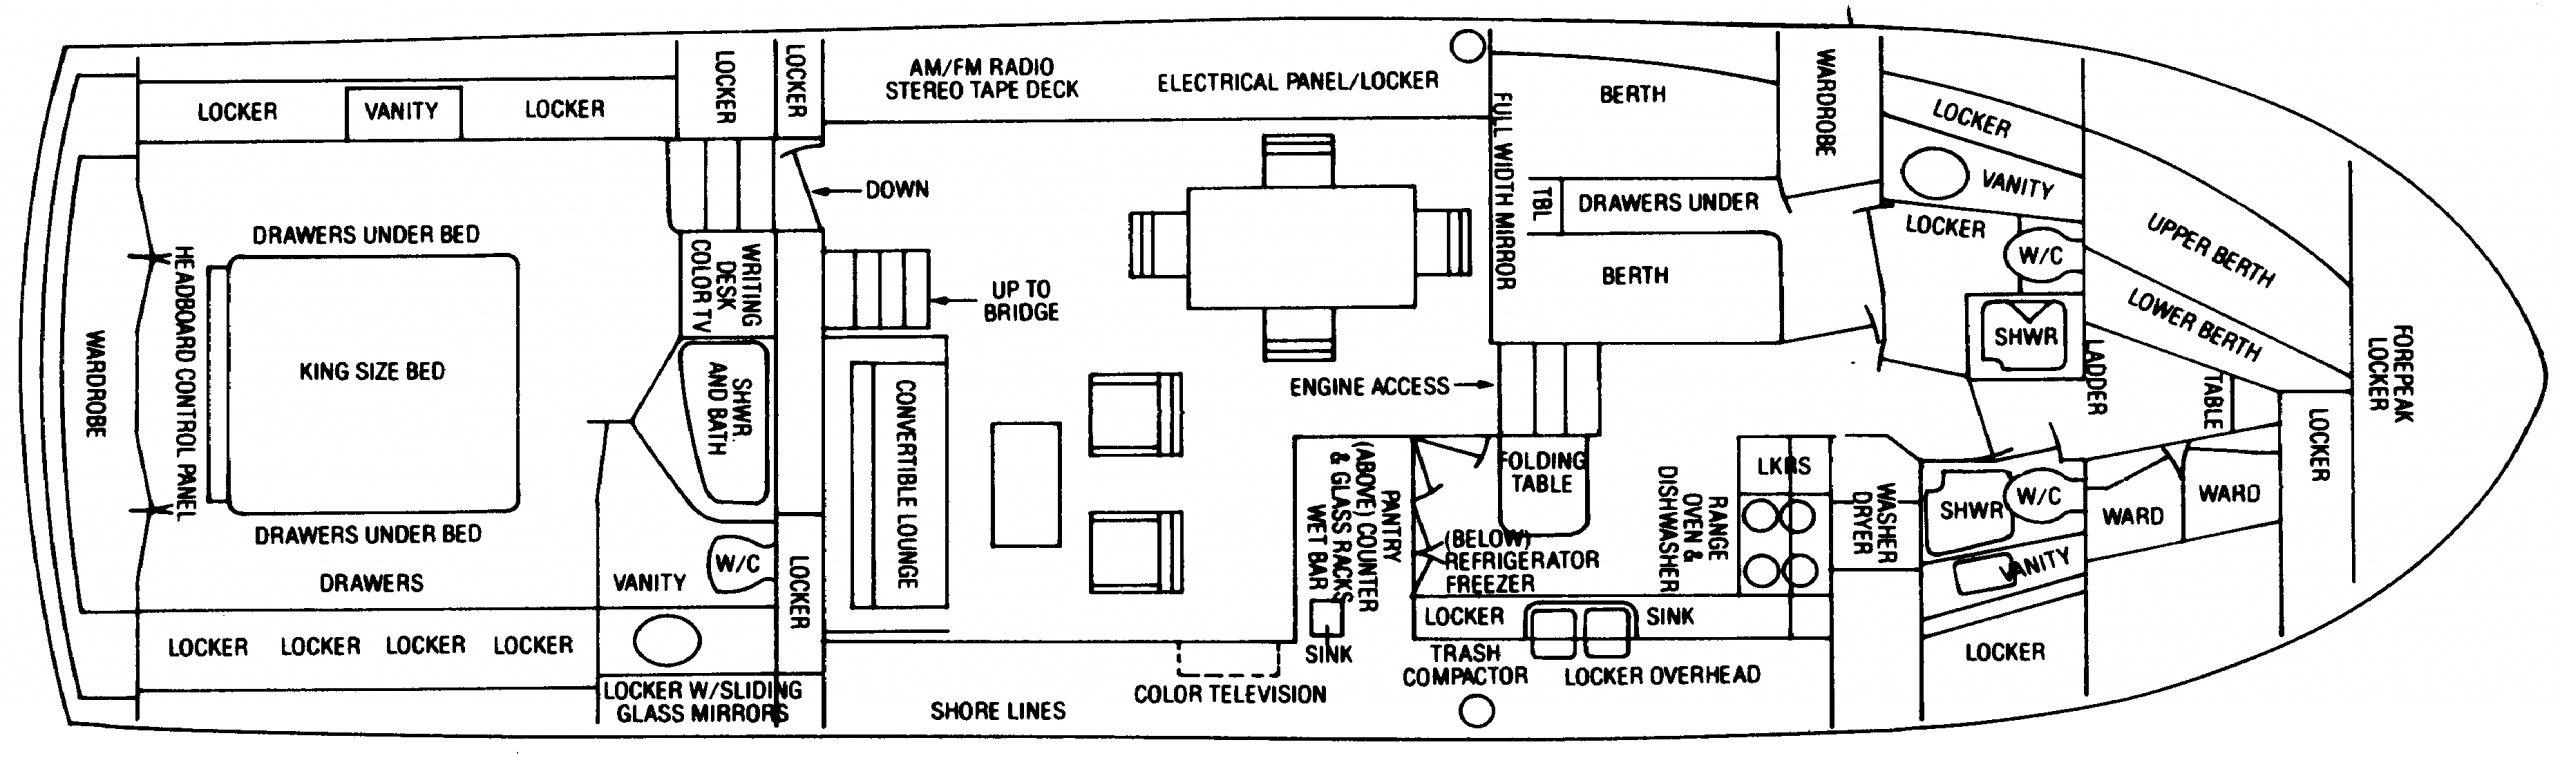 58 Motor Yacht Floor Plan 1